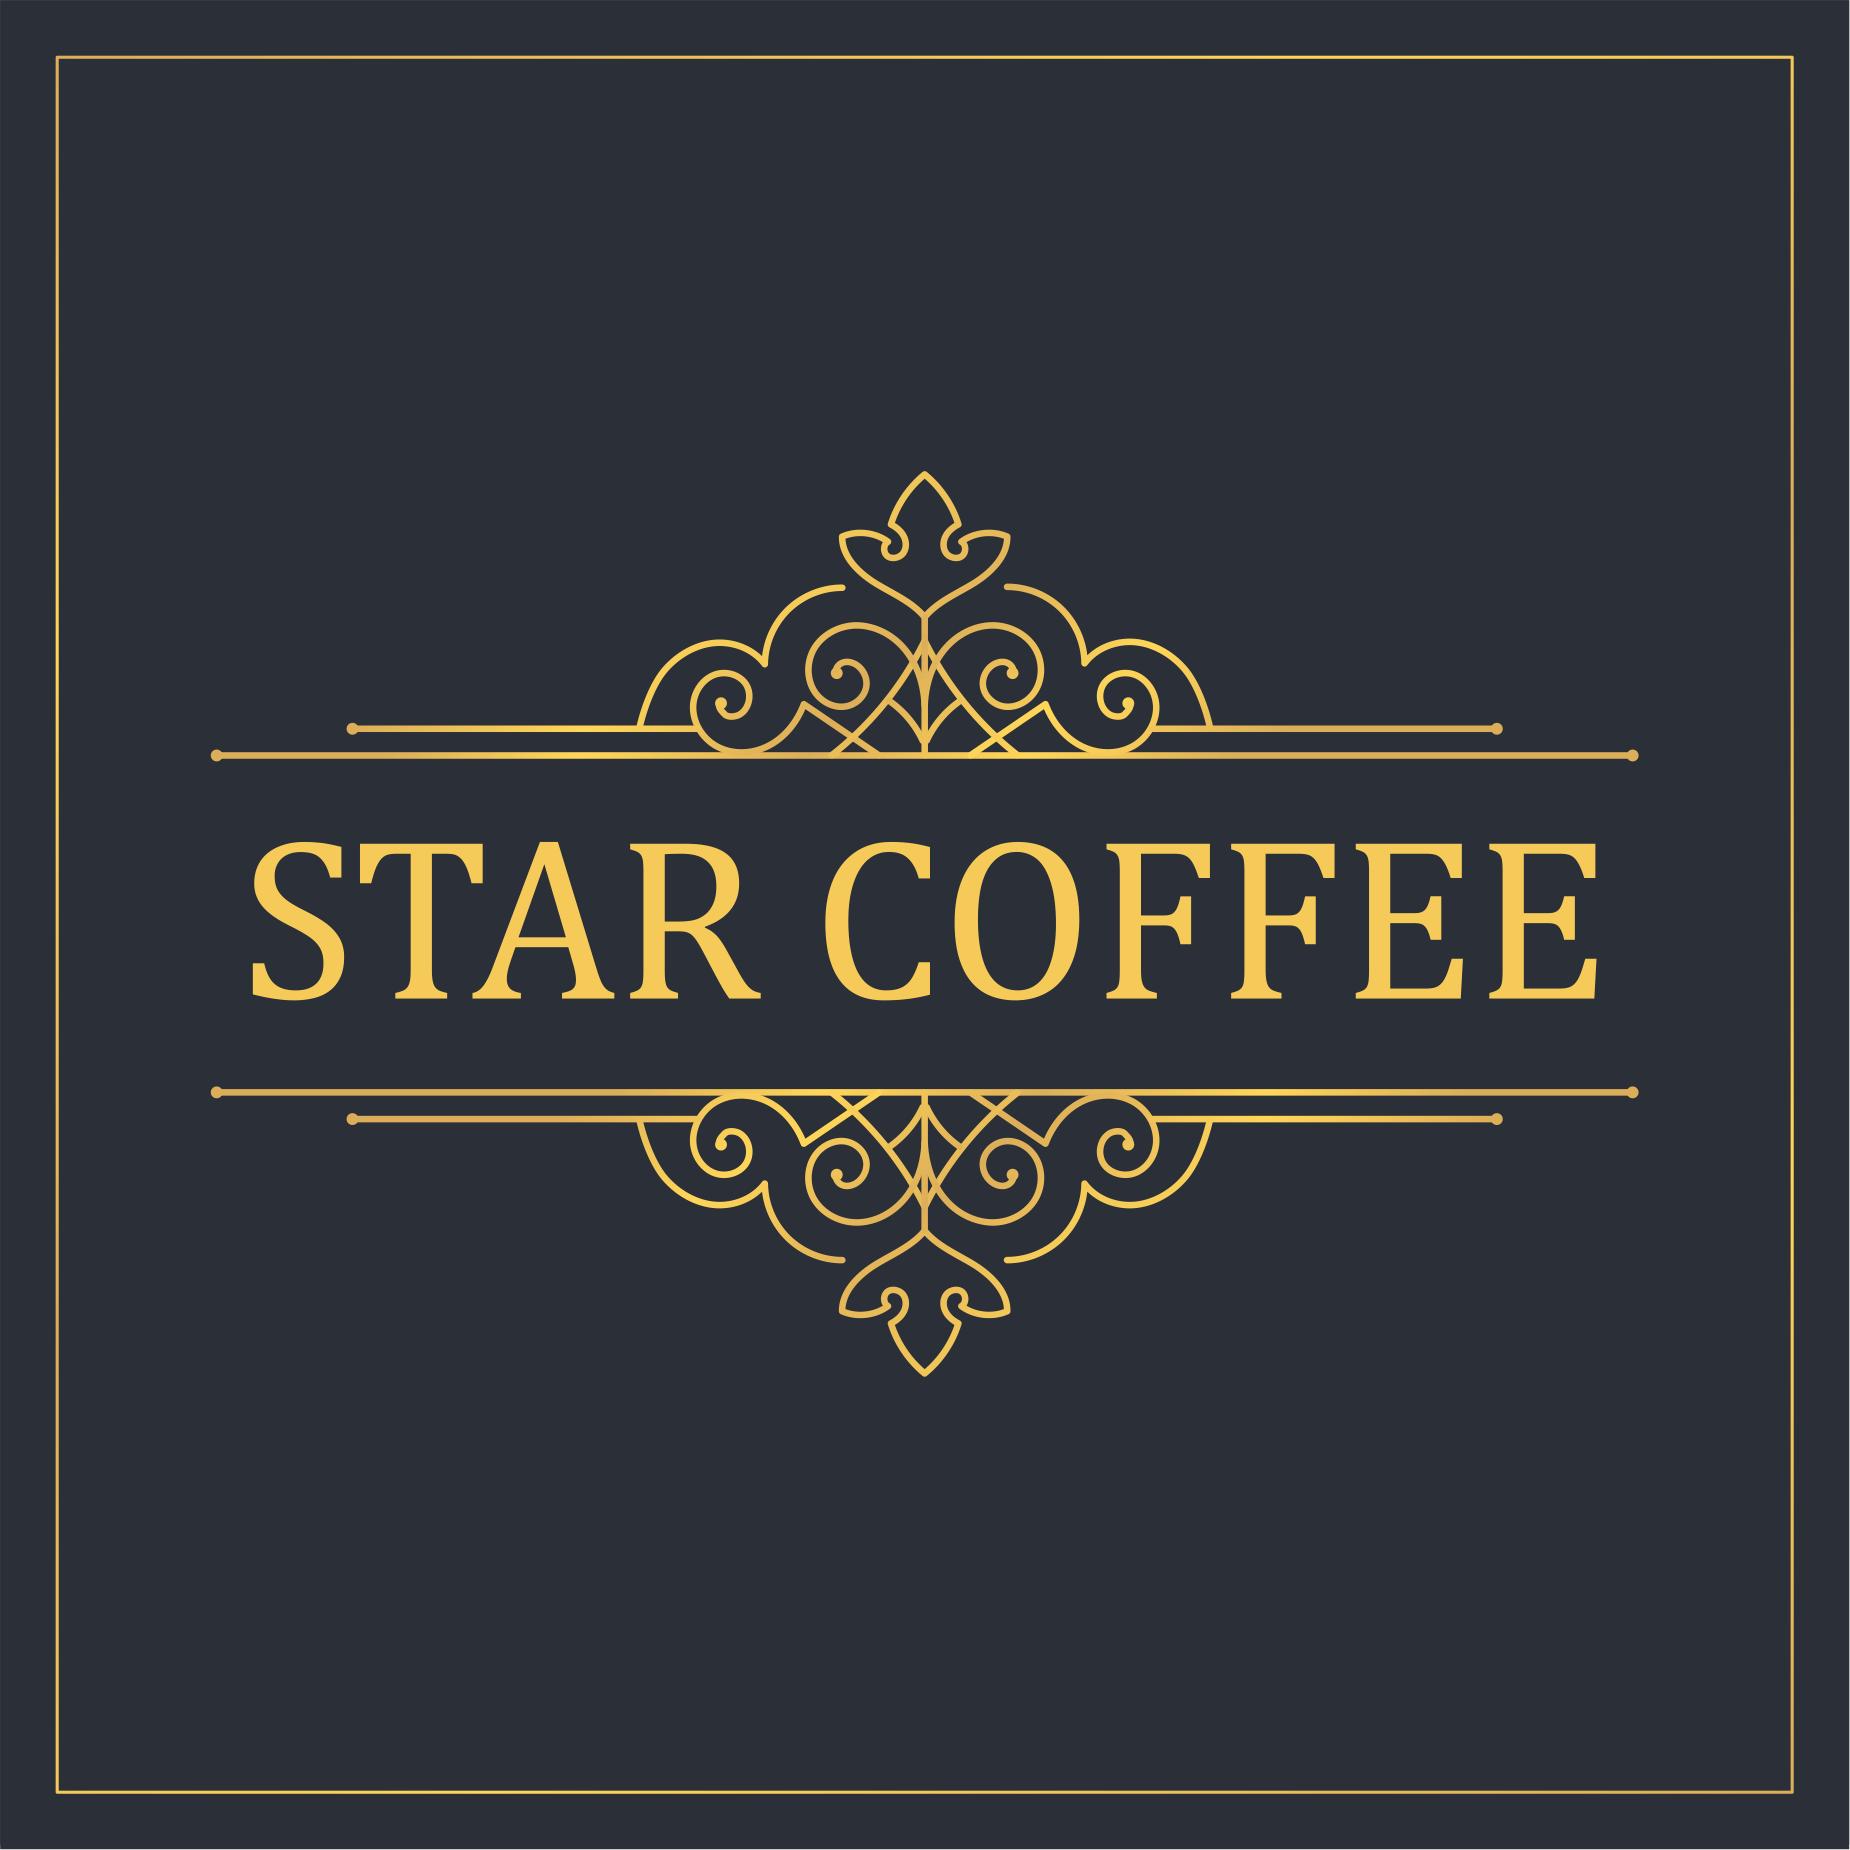 Starcoffee